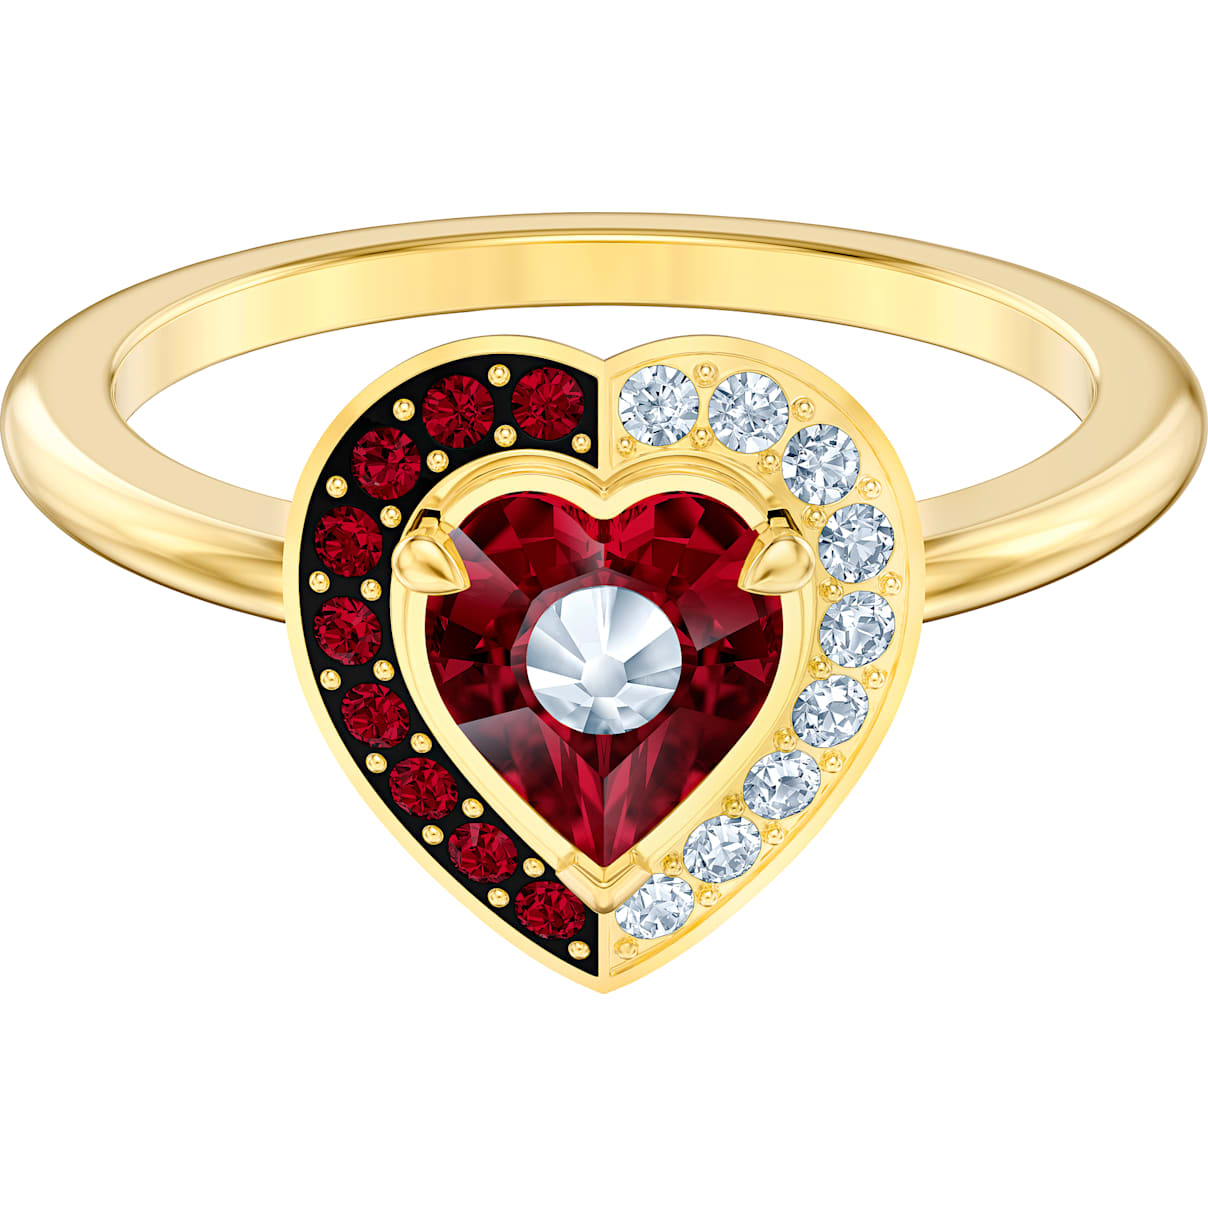 Swarovski Black Baroque Motif Ring, Red, Gold-tone plated